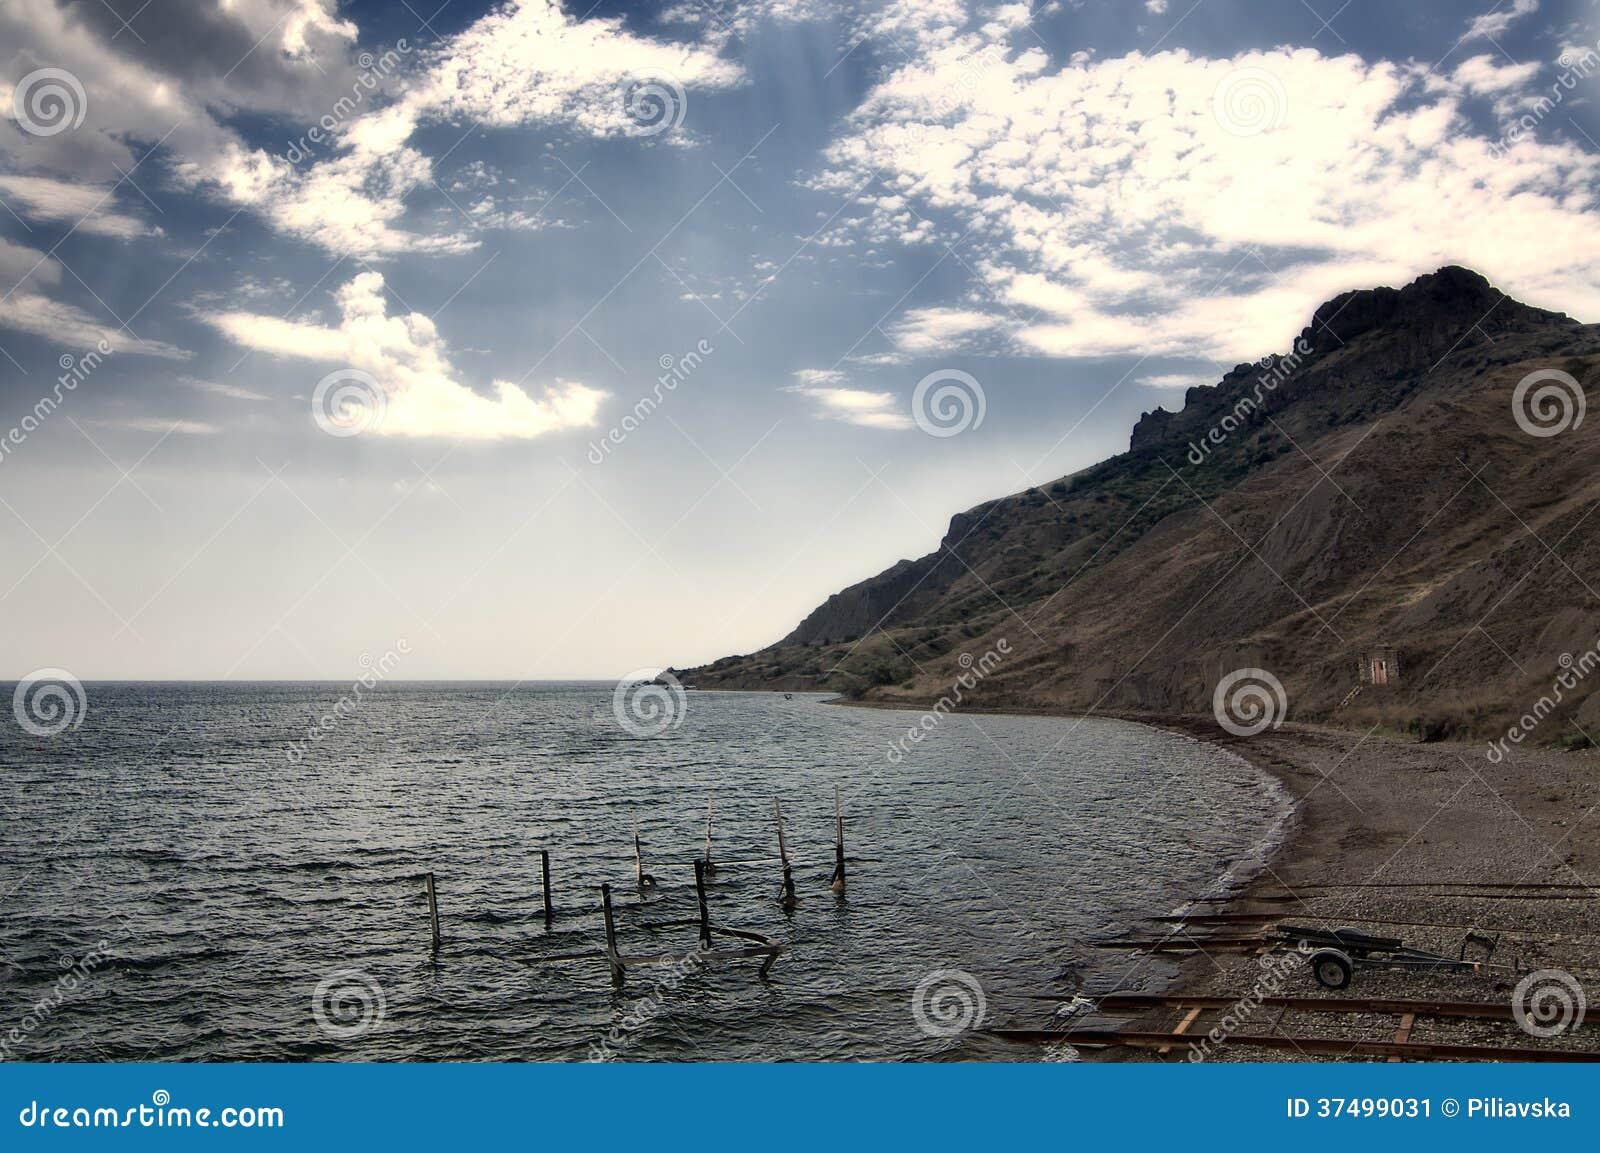 Famous sights of Koktebel